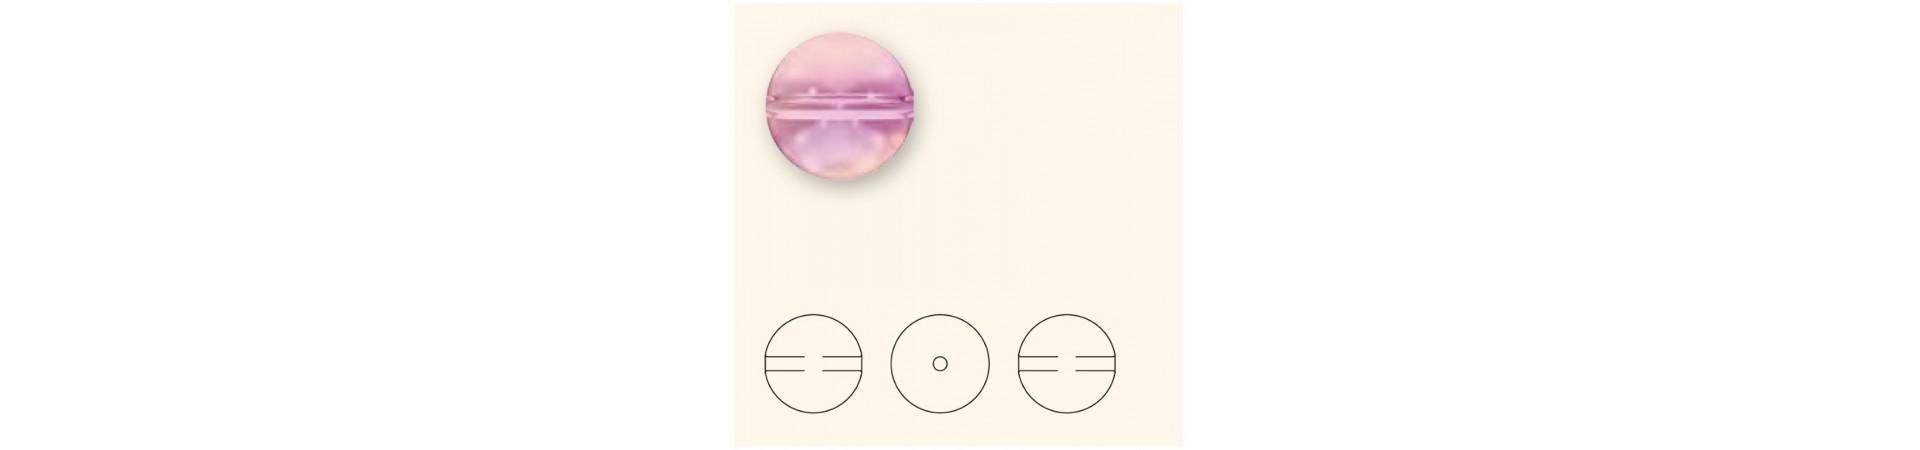 5028/4 Crystal Globe Beads